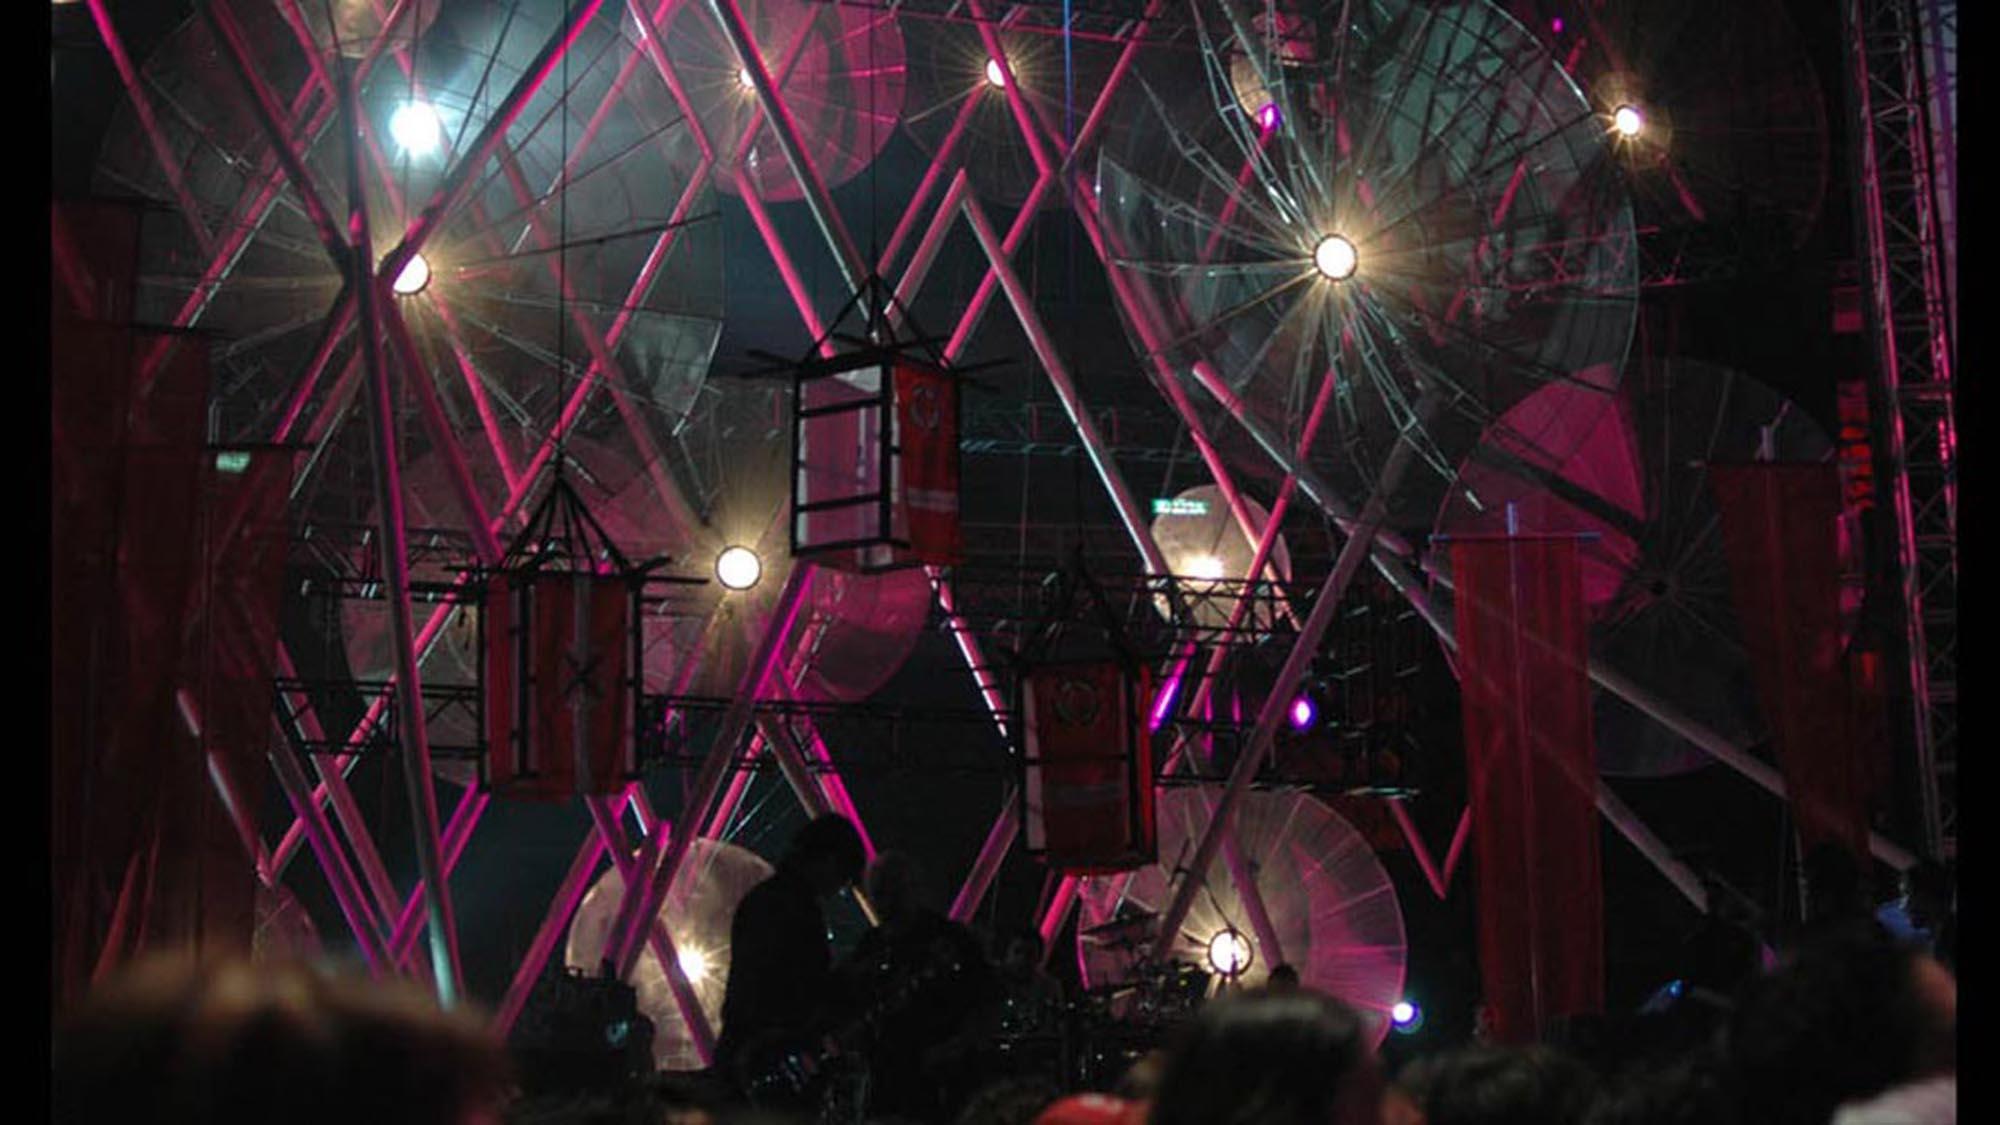 Los-Premios_07_05-smsized